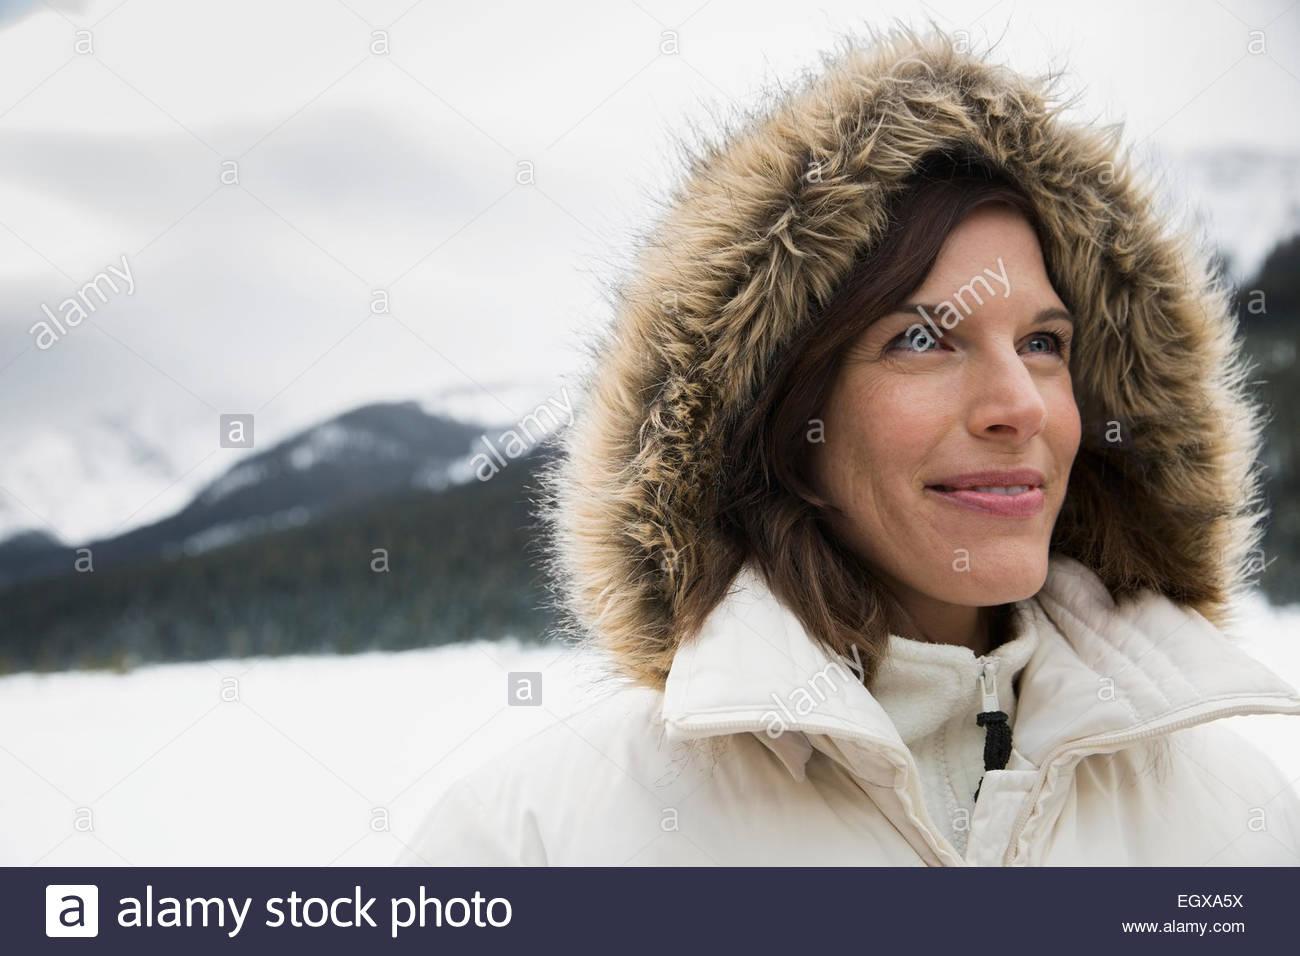 Smiling woman in fur hood in snowy field - Stock Image